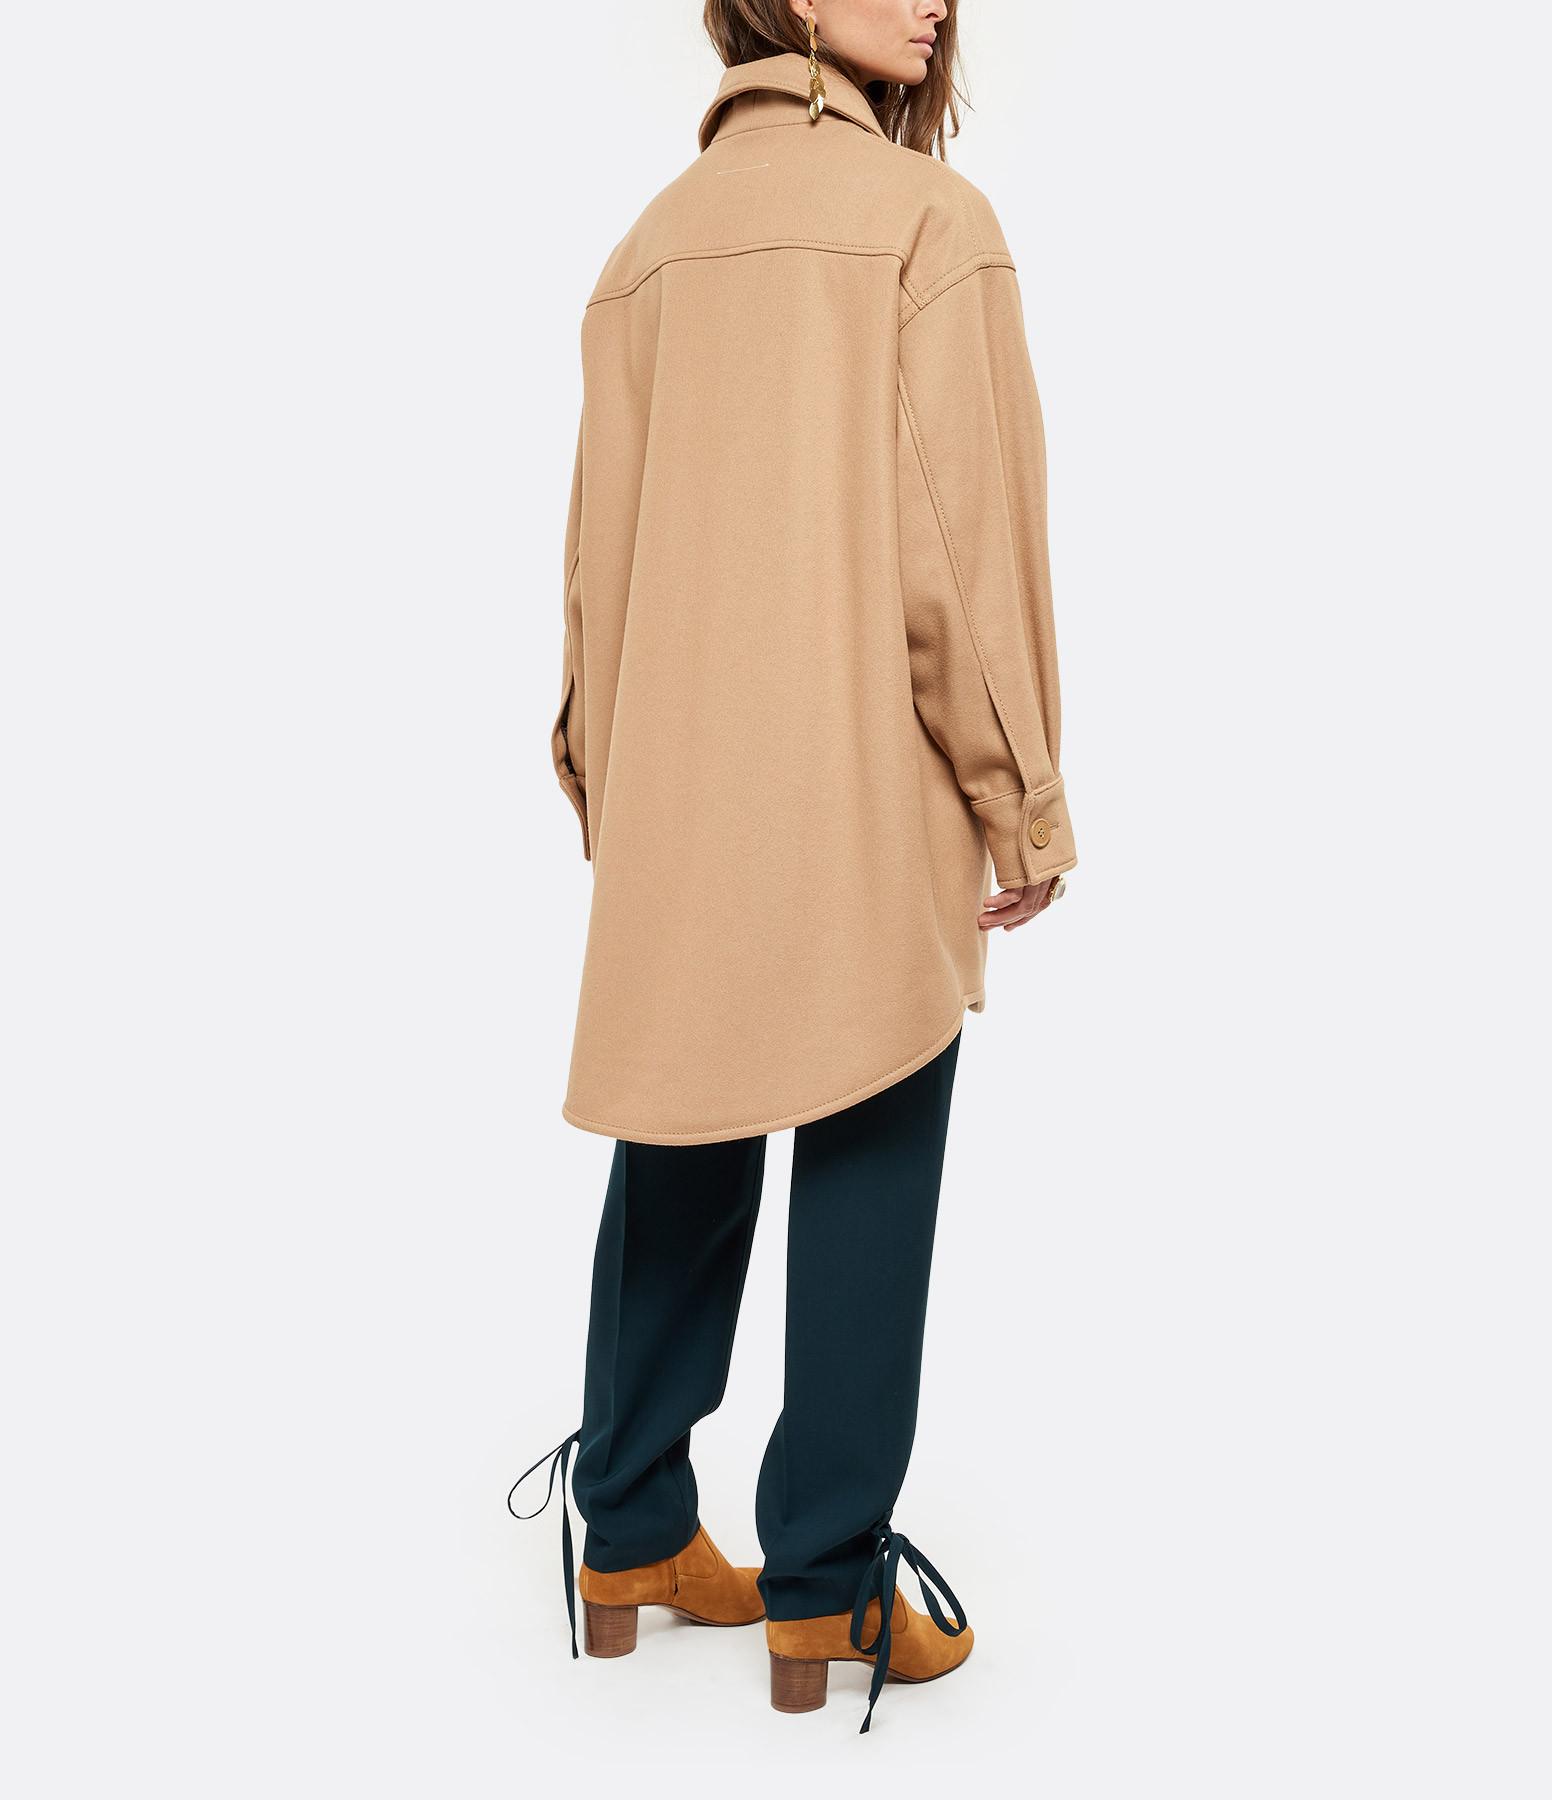 MM6 MAISON MARGIELA - Veste Laine Oversize Camel